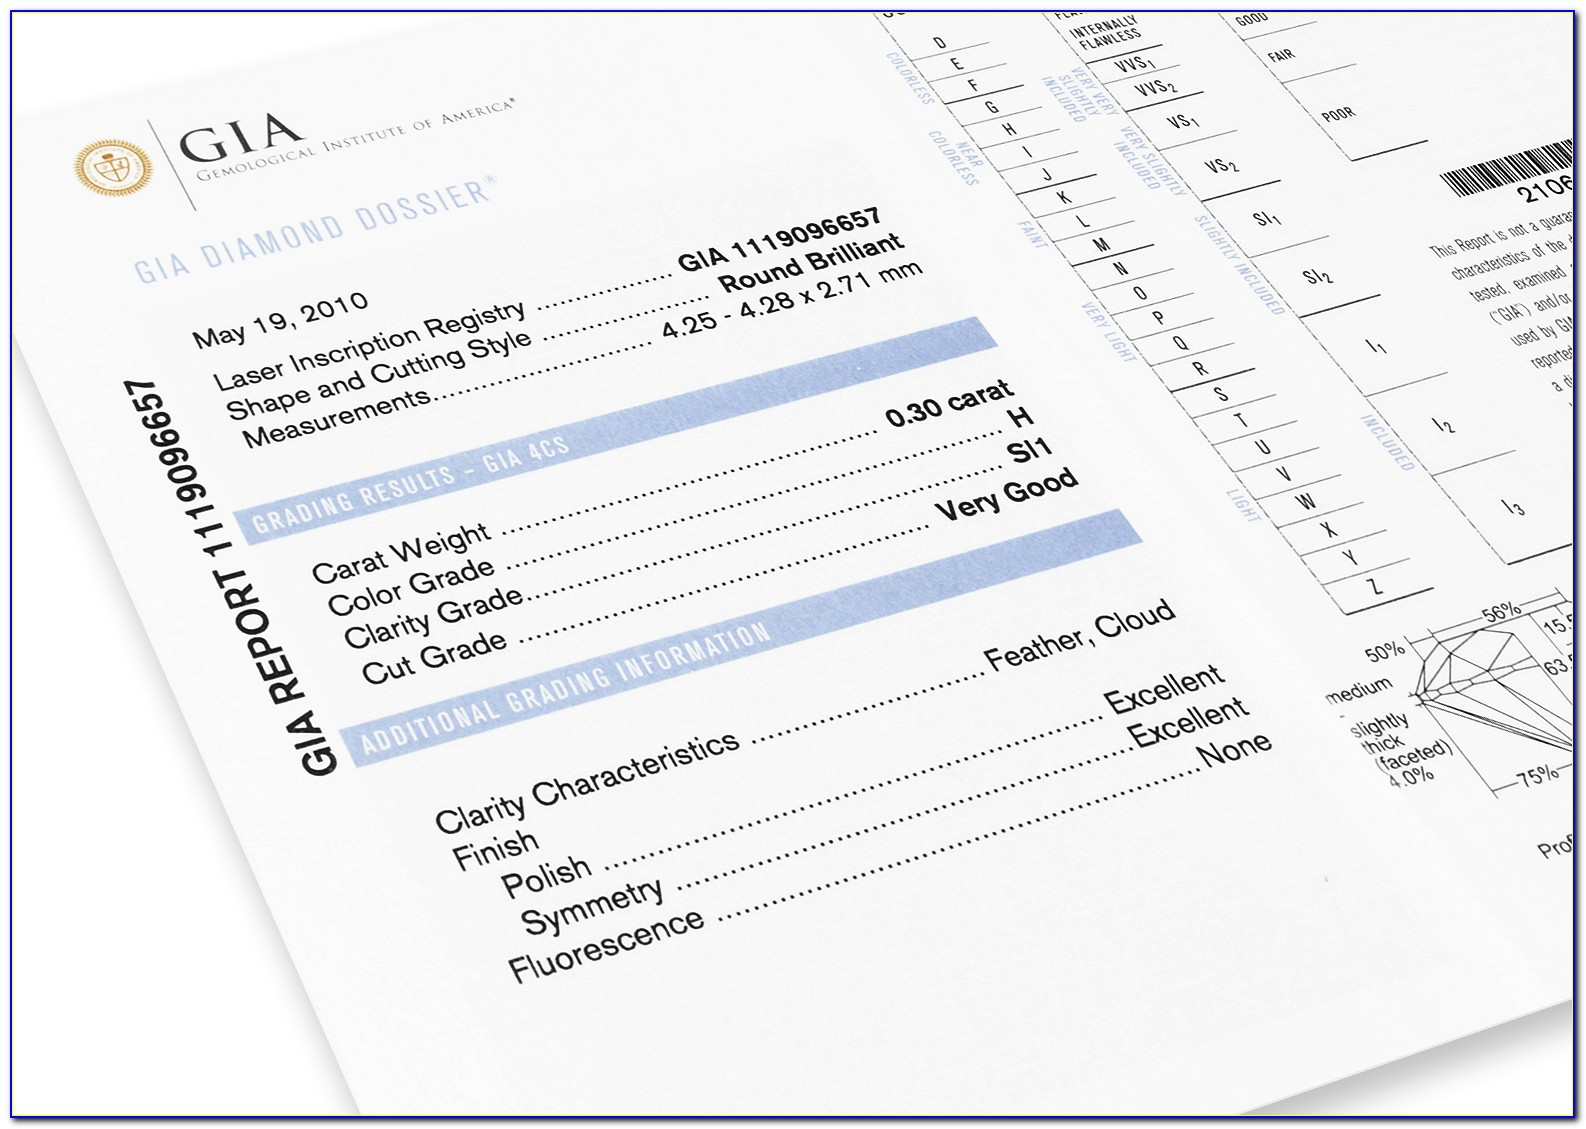 Gia Diamond Certificate Lookup